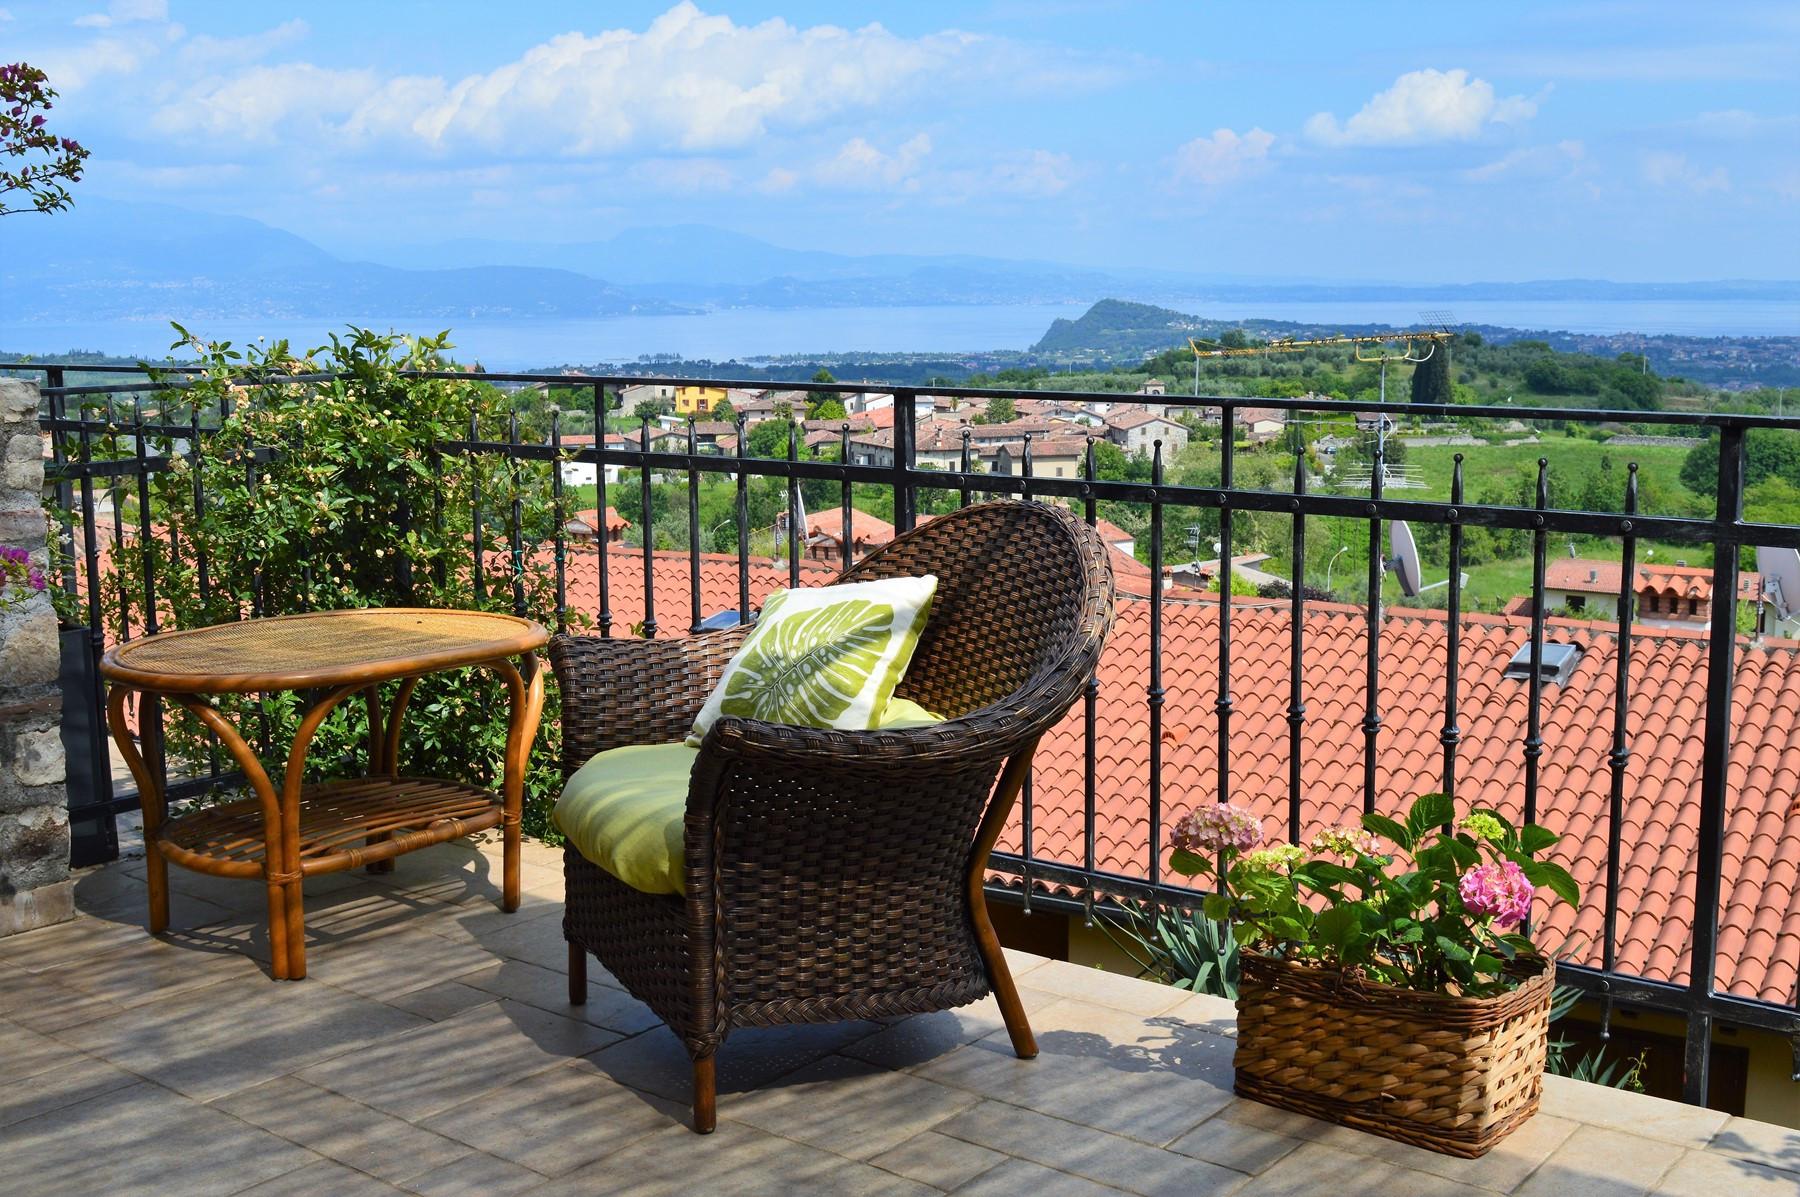 Ferienwohnungen Puegnago sul Garda - Terrazze sul Garda